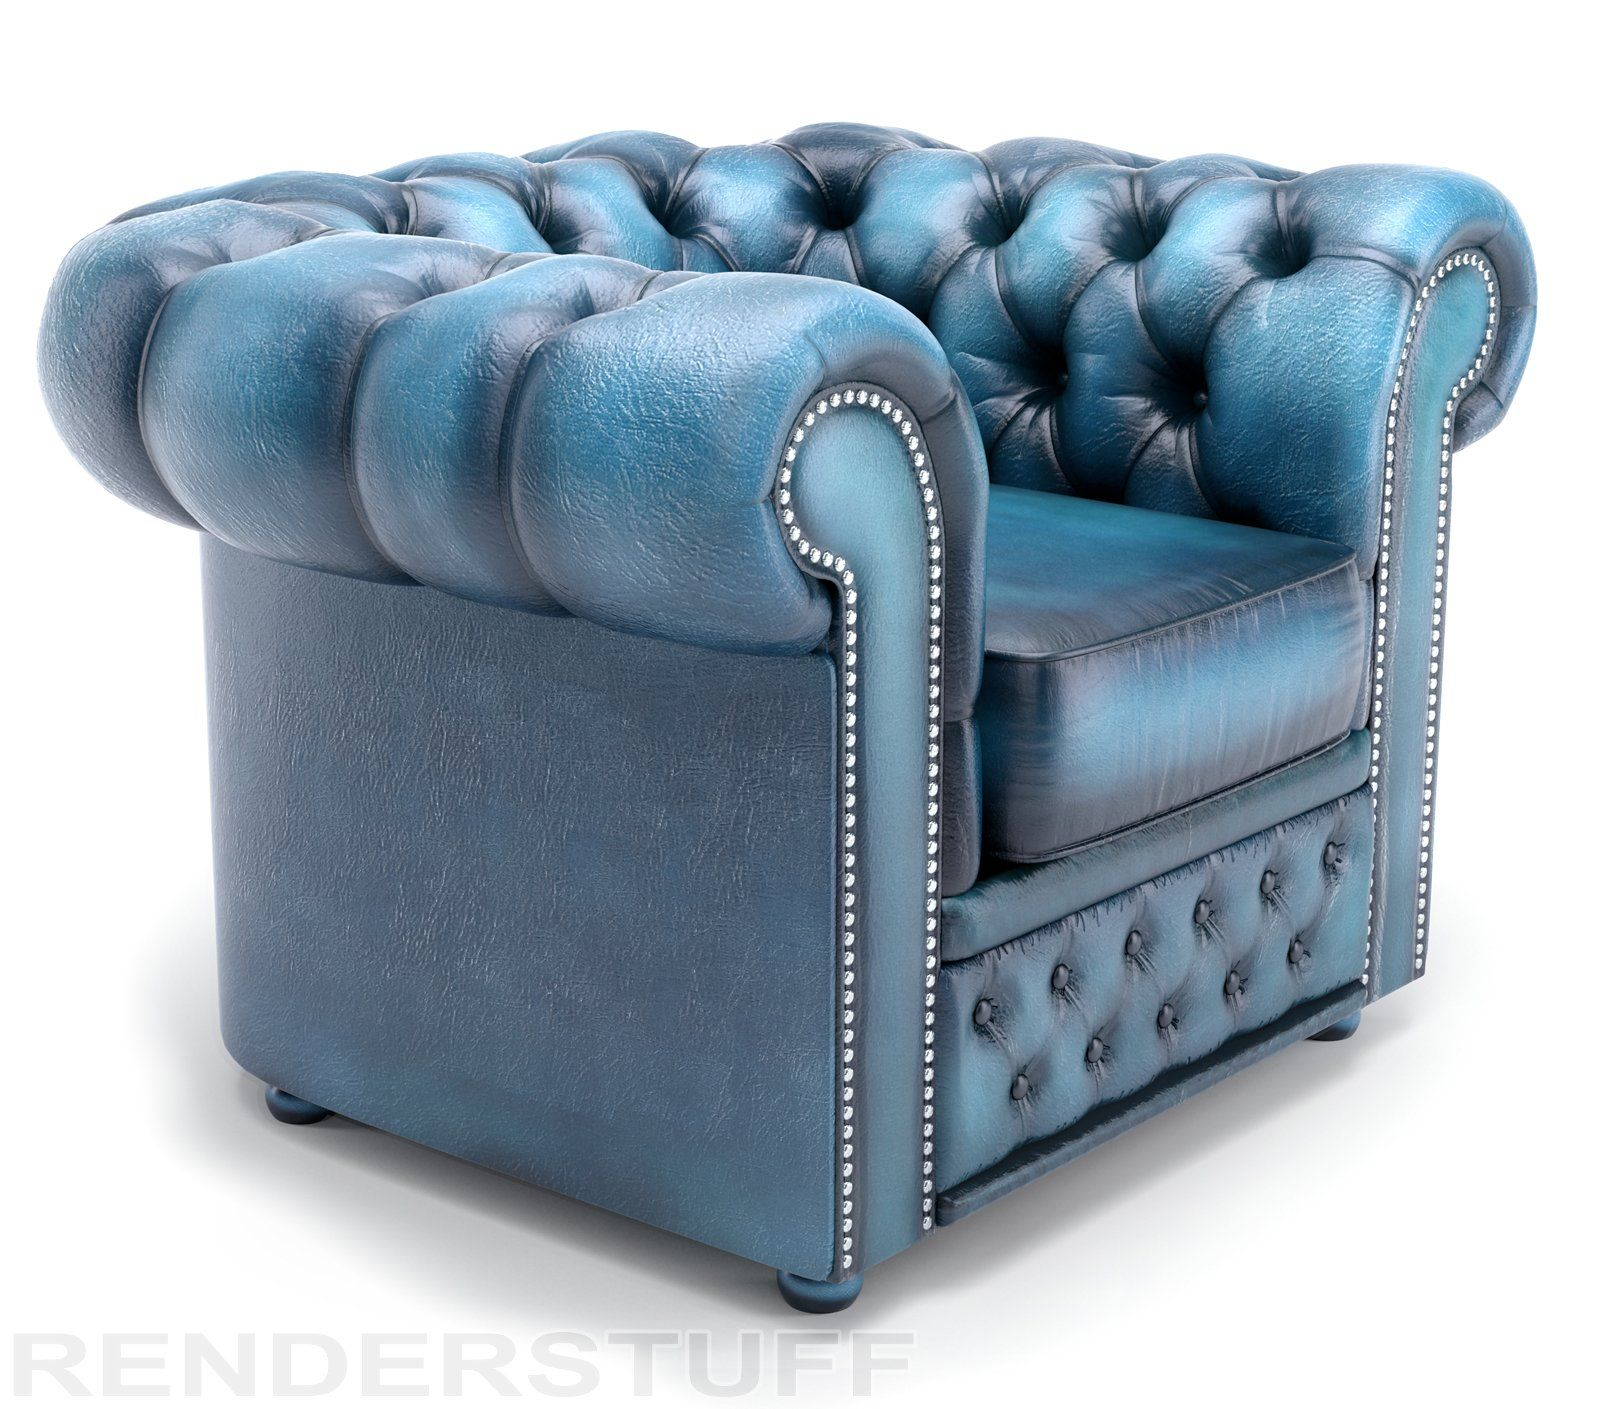 Vintage blue chesterfield sofa | Gorgeous Home Decor | Pinterest